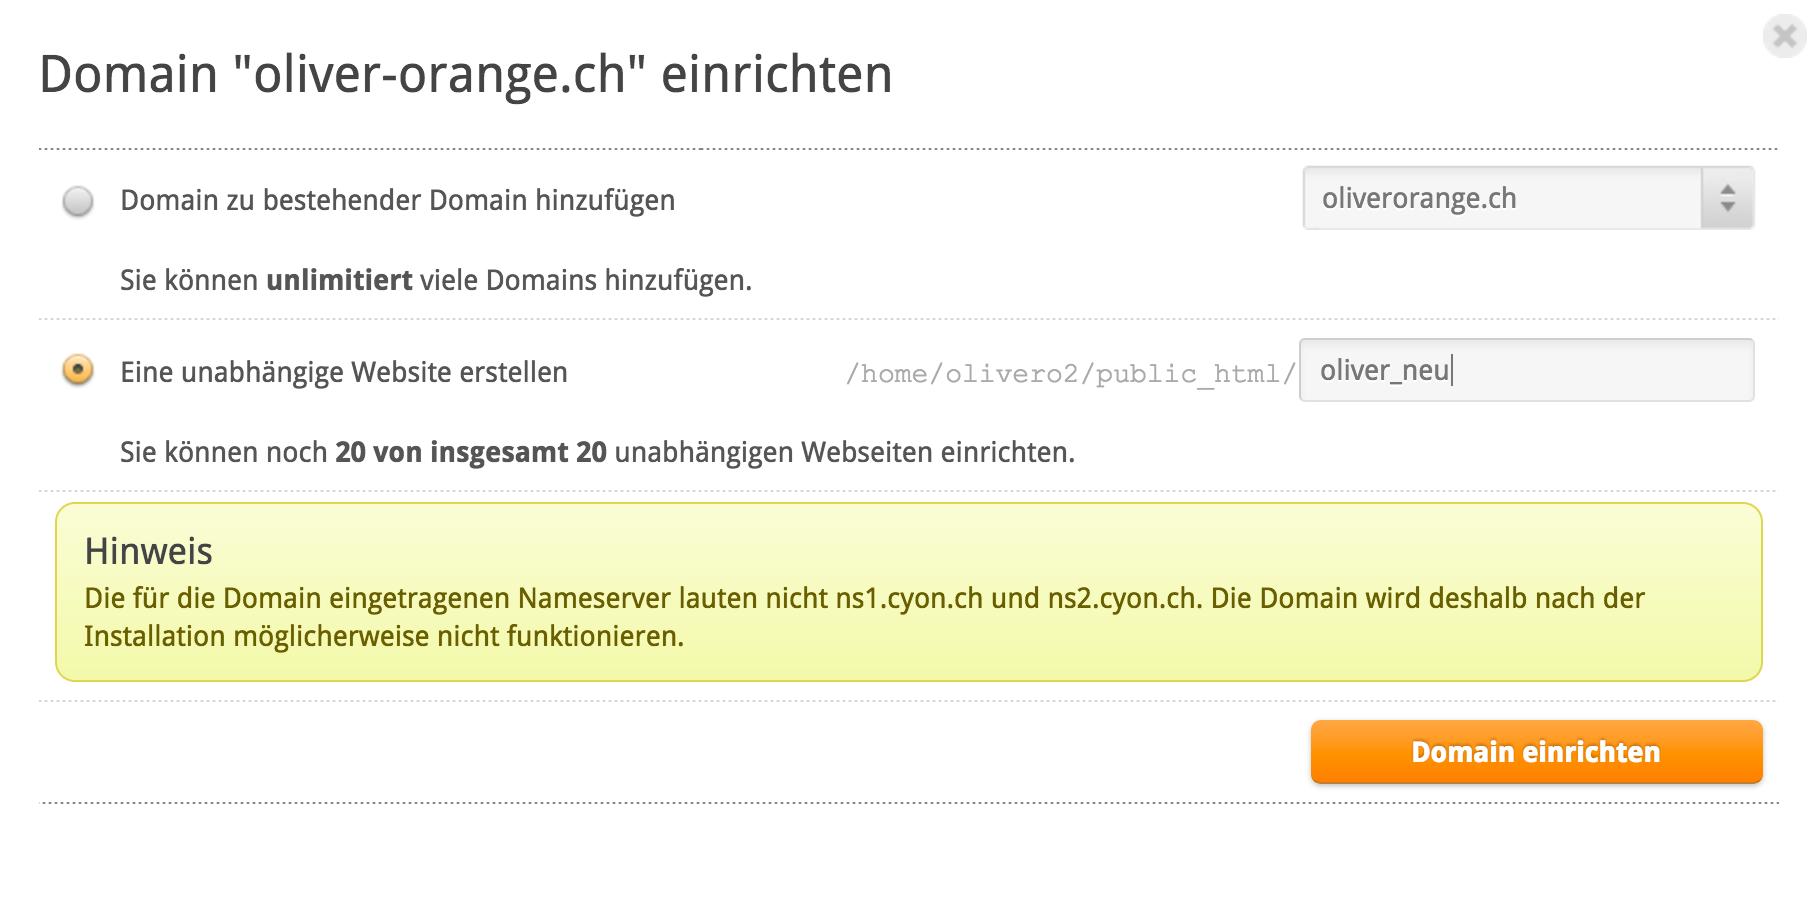 Unabhängige Domain